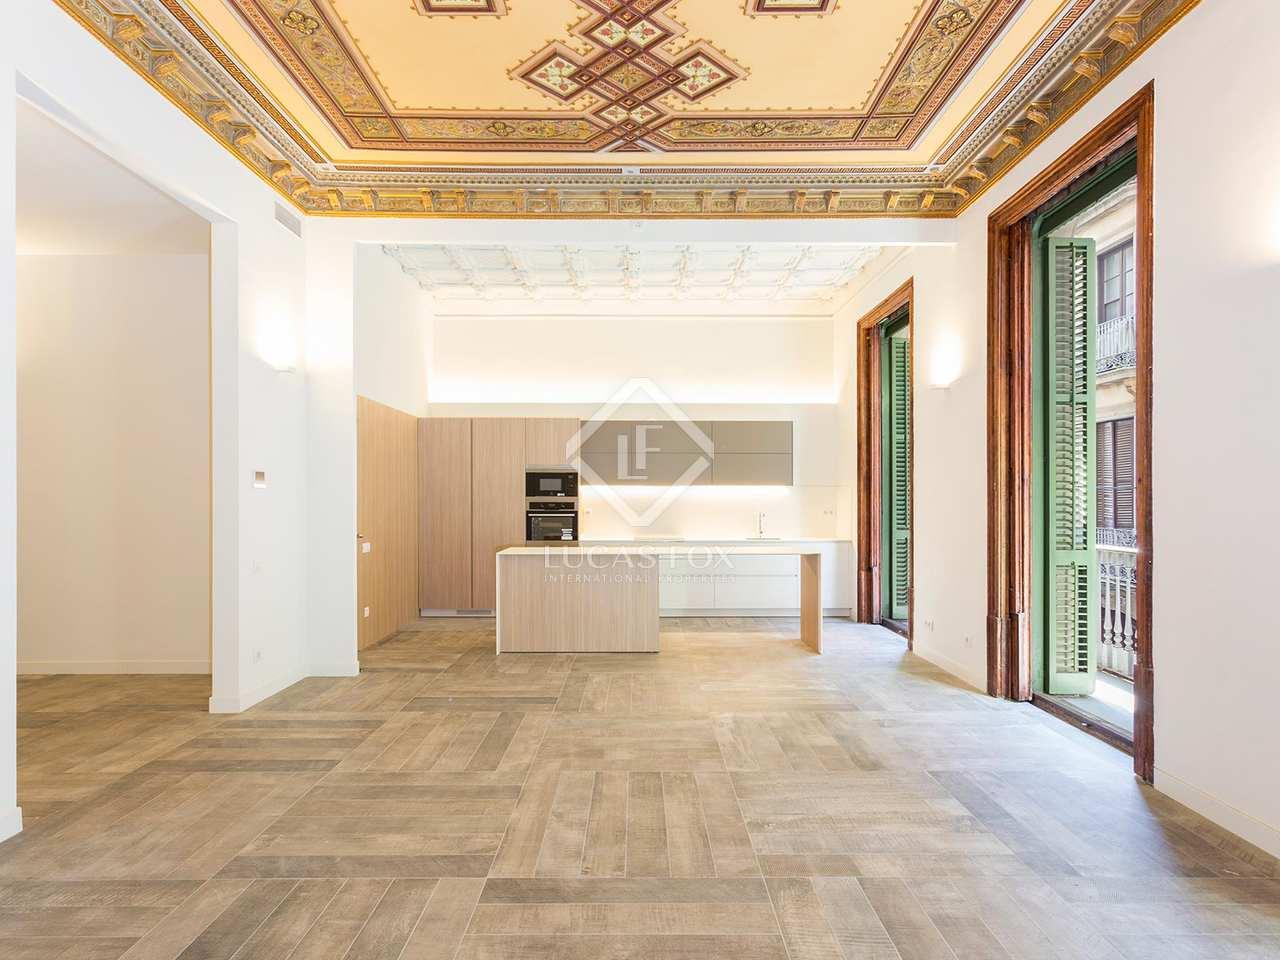 Appartement de 175m a vendre g tico barcelone for Appartement avec piscine barcelone